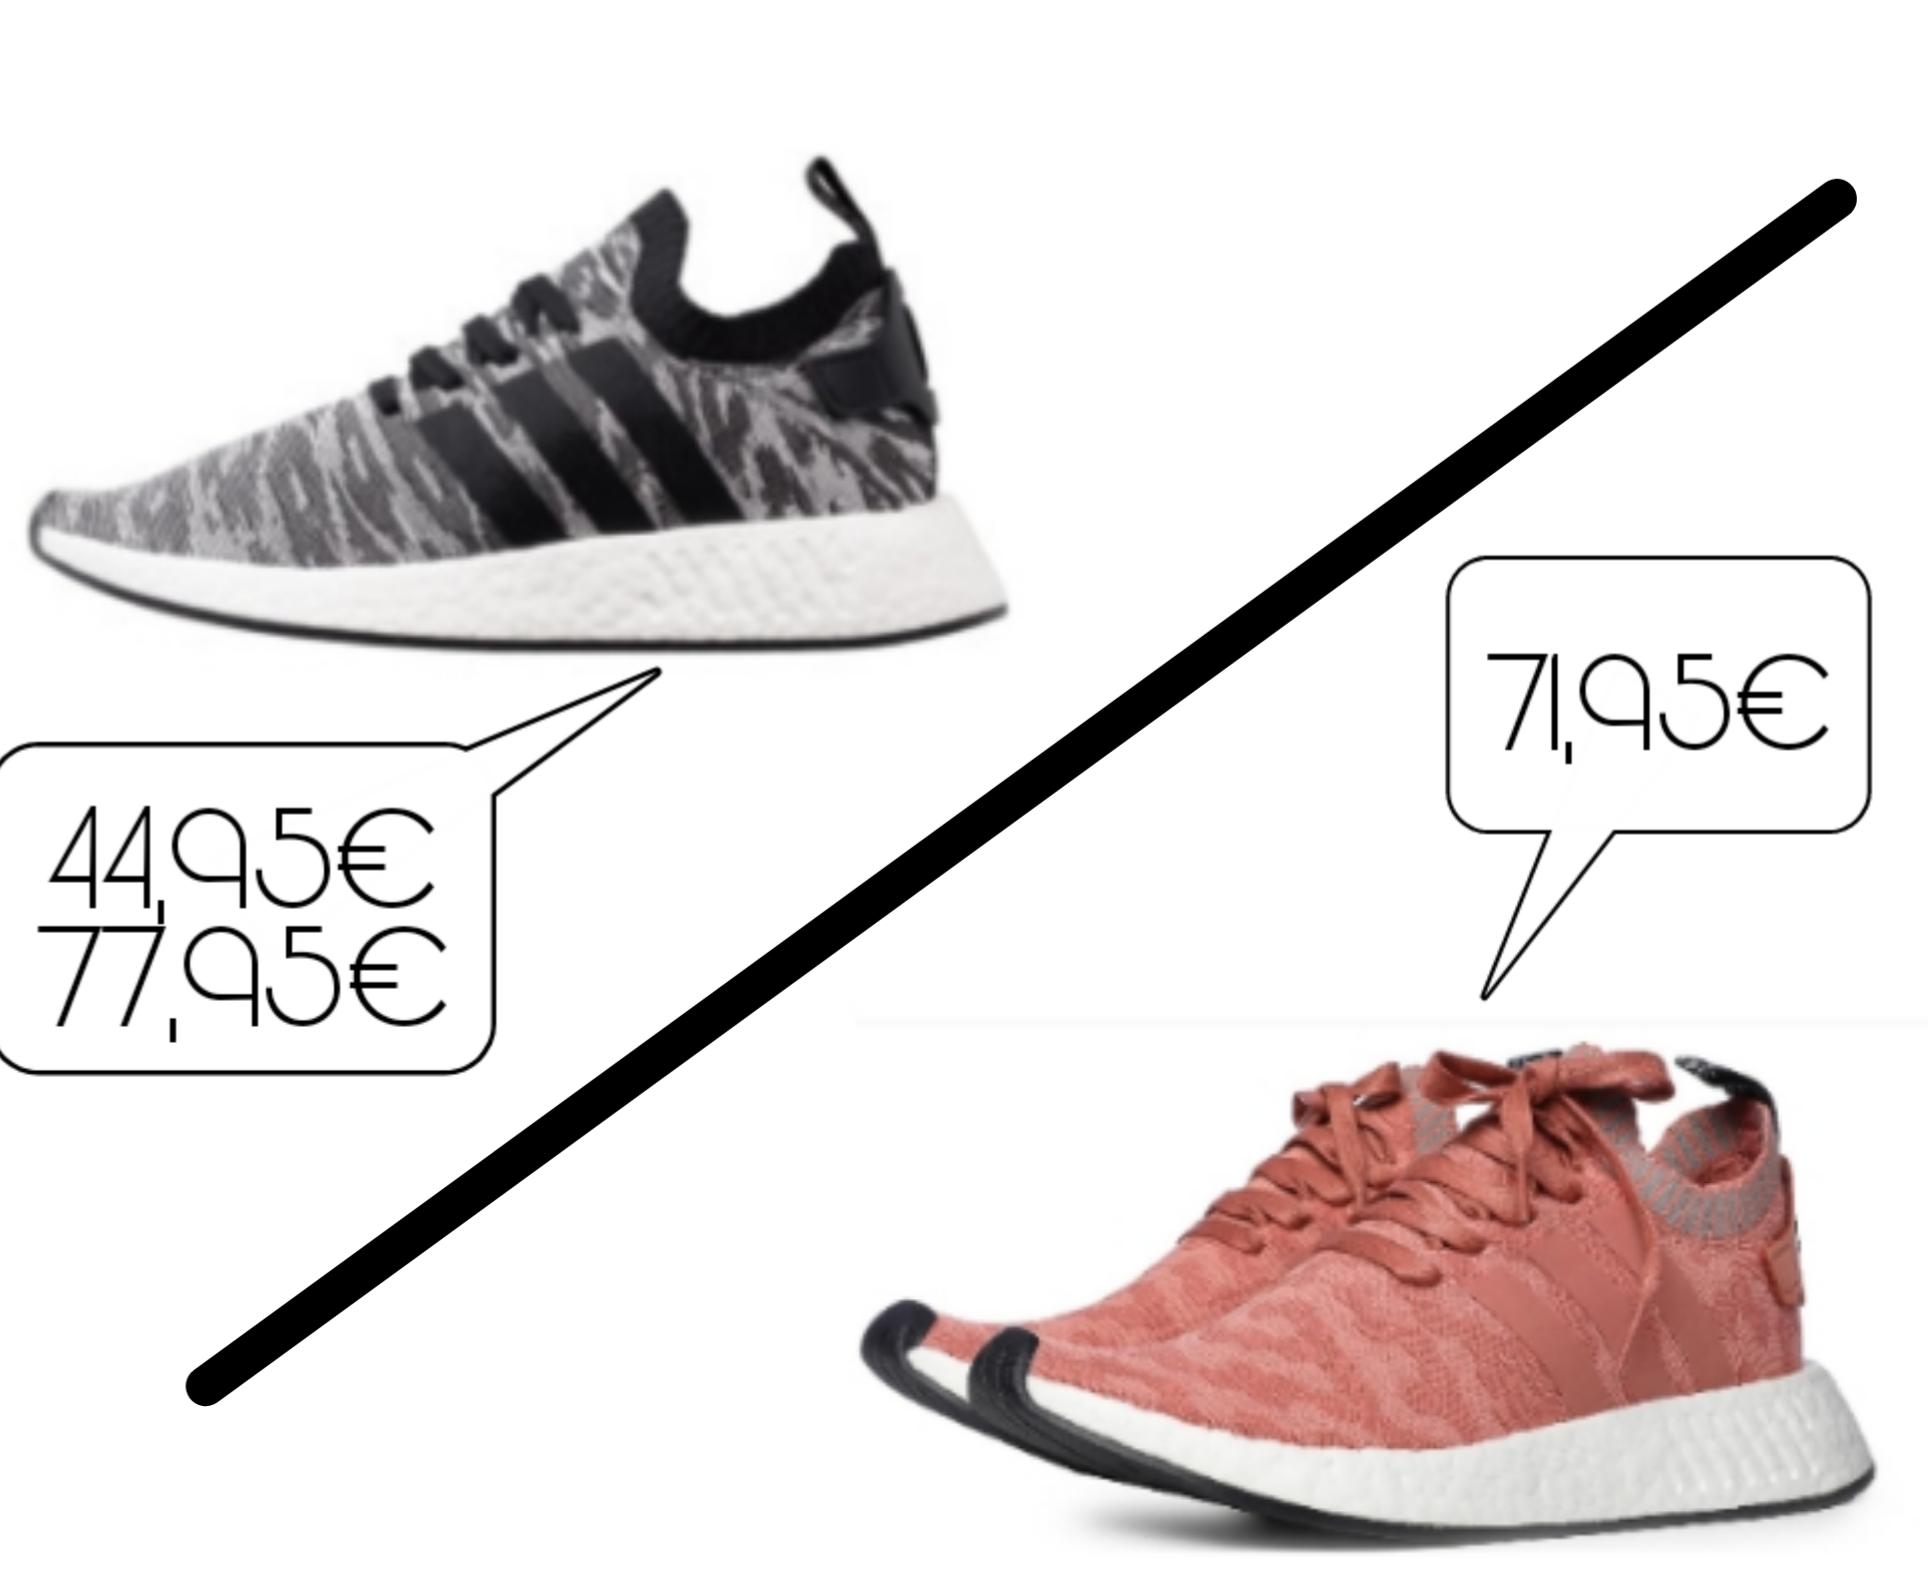 Adidas NMD R2 PK Sale!!! Bei Mandmdirect/Amazon